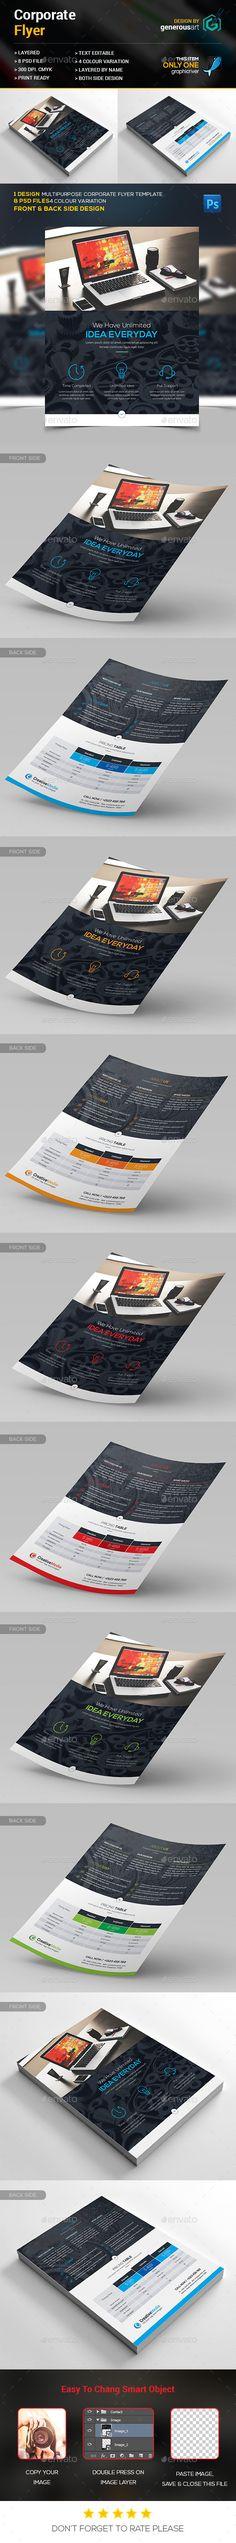 Flyer Template PSD #design Download: http://graphicriver.net/item/flyer/13818747?ref=ksioks